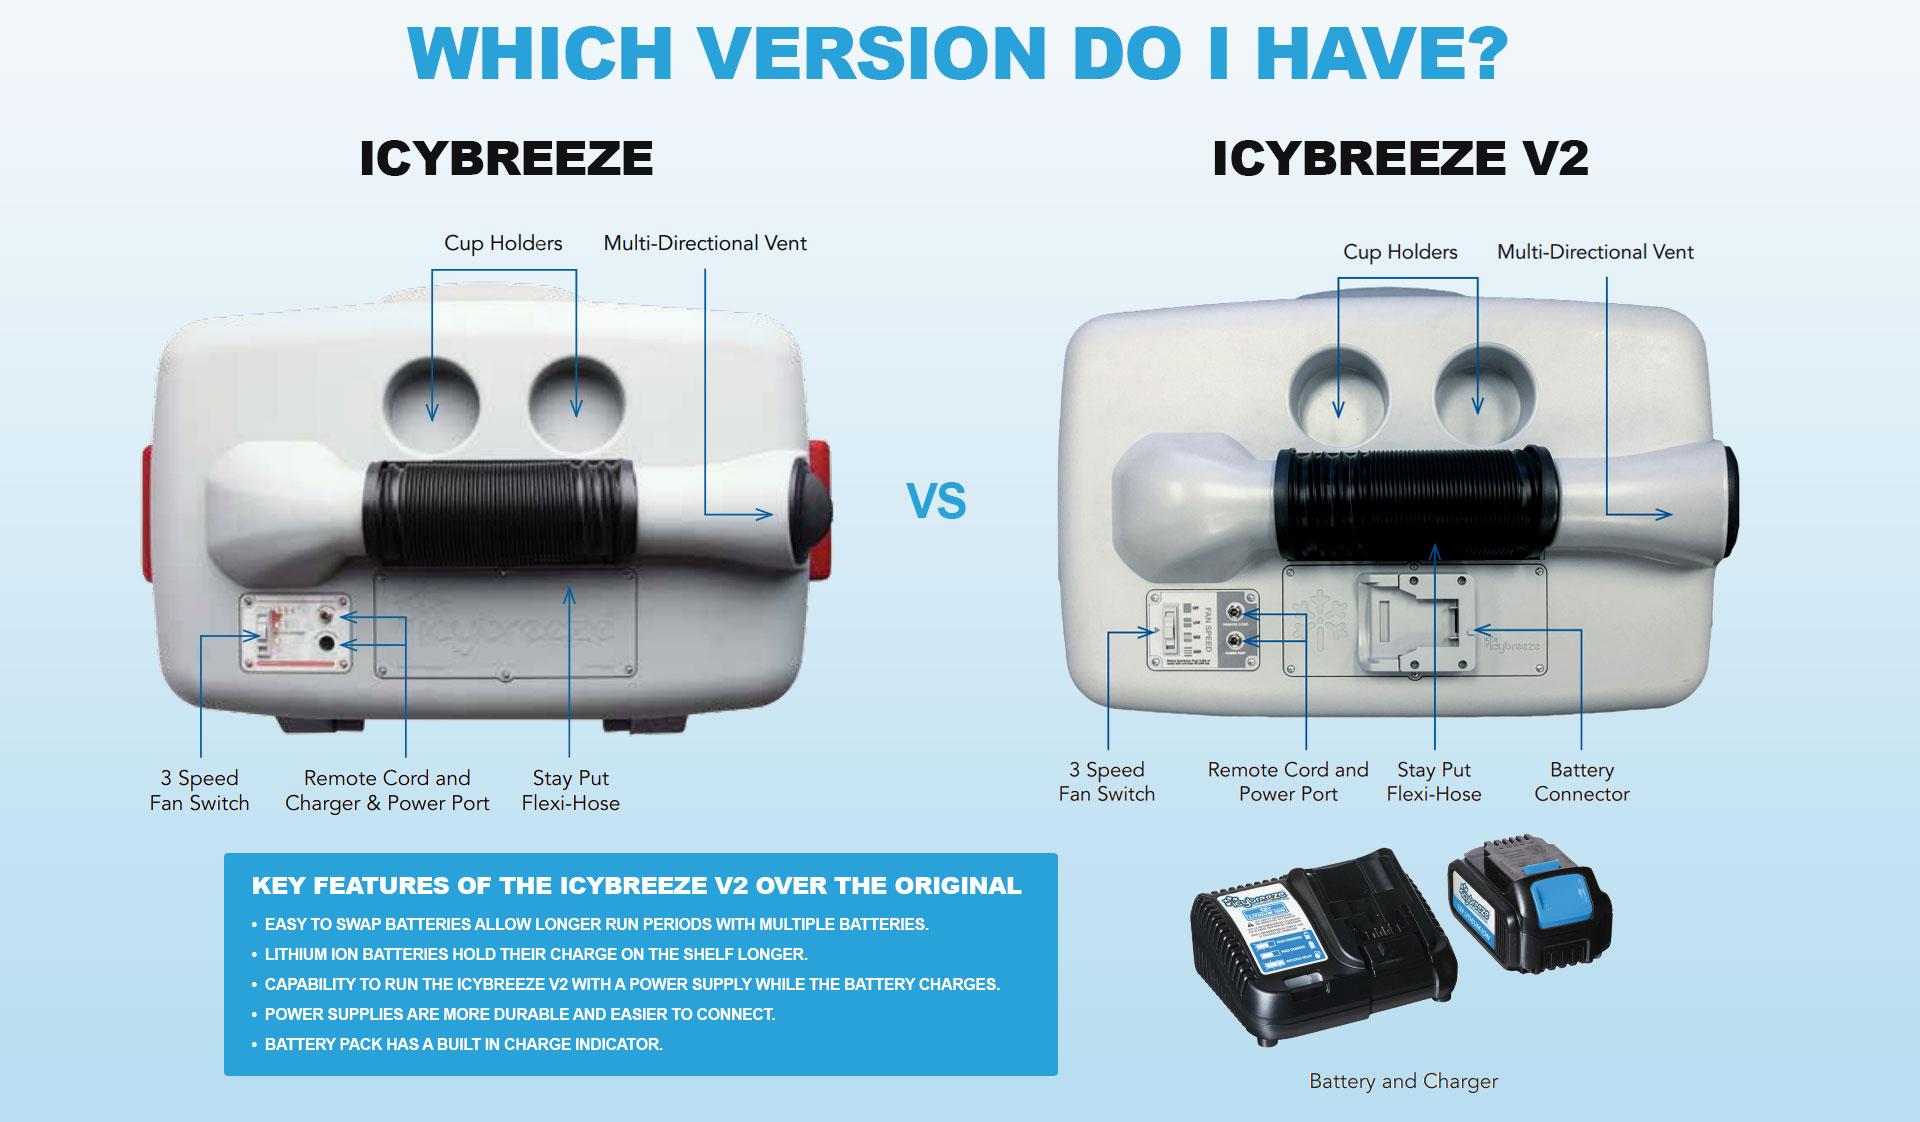 IcyBreeze Version Comparison